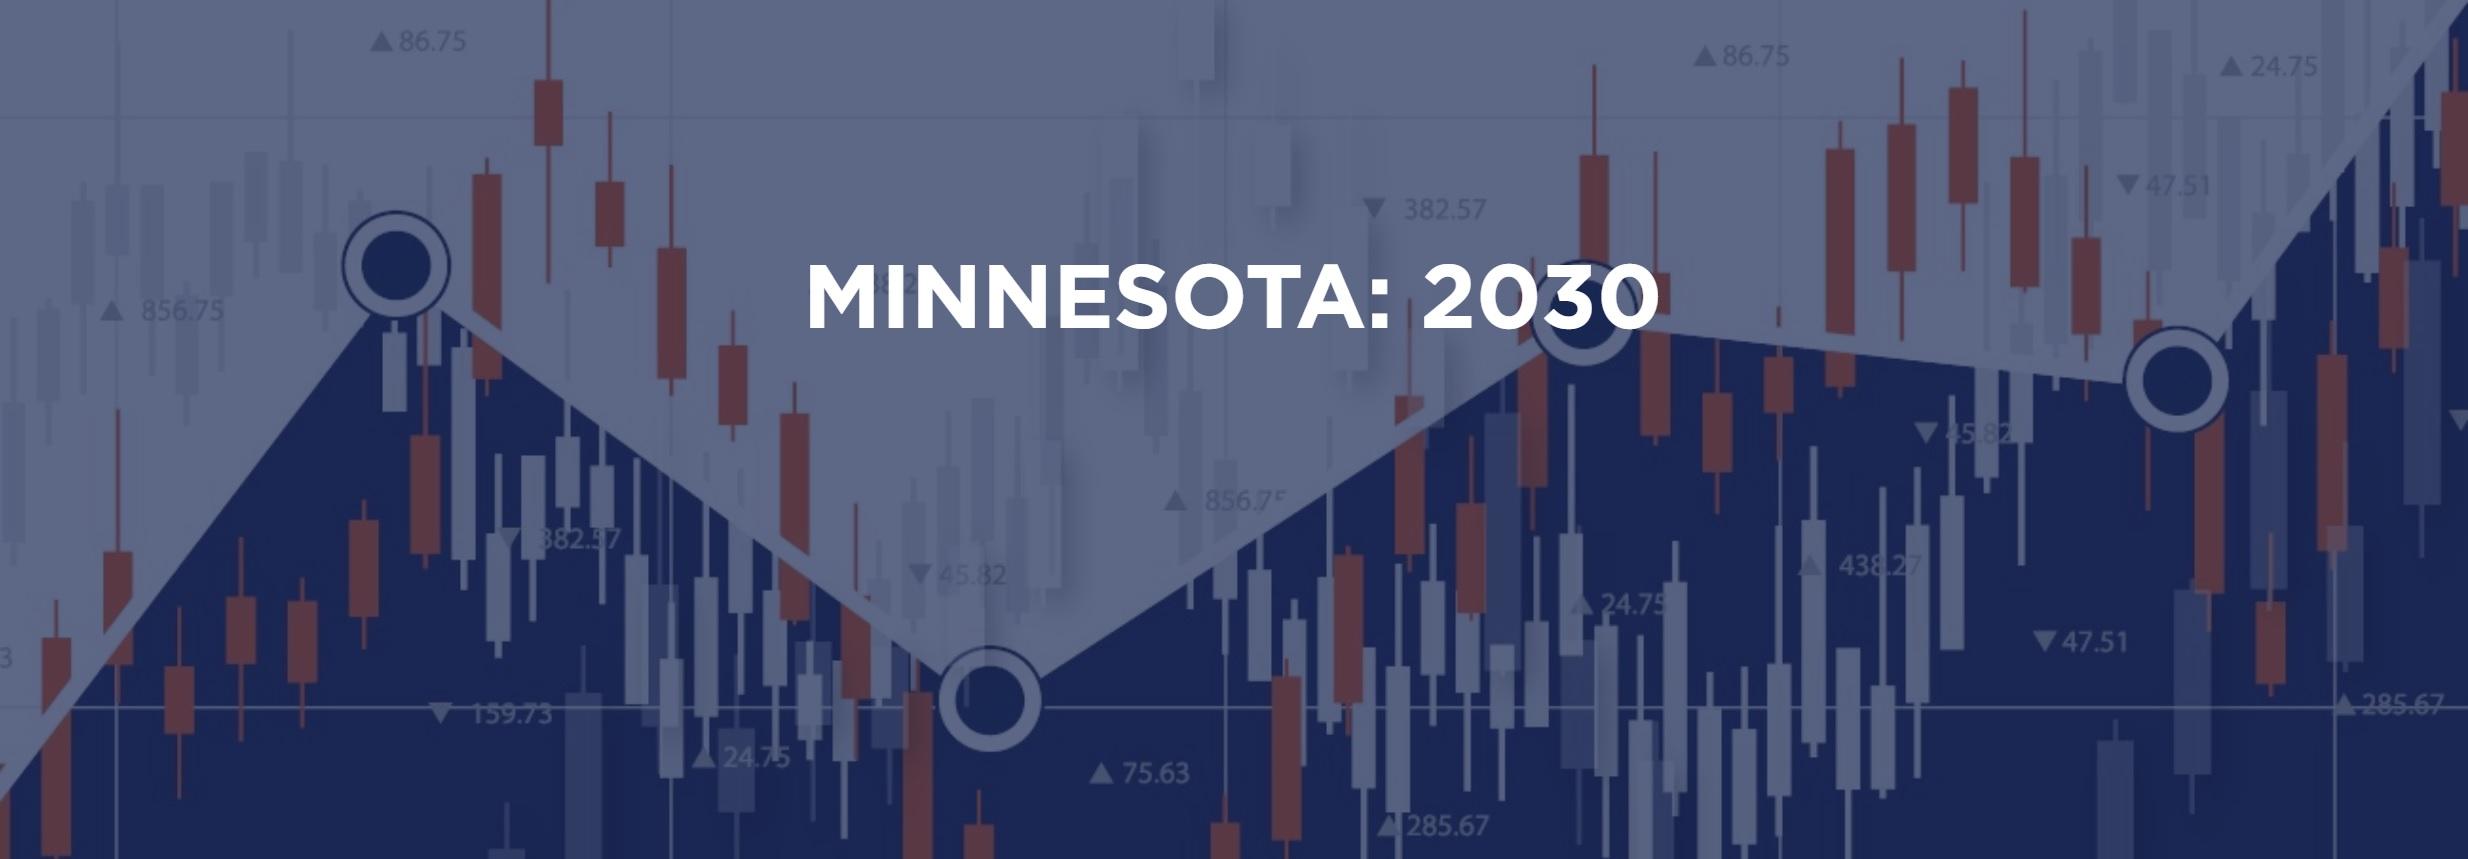 Minnesota: 2030